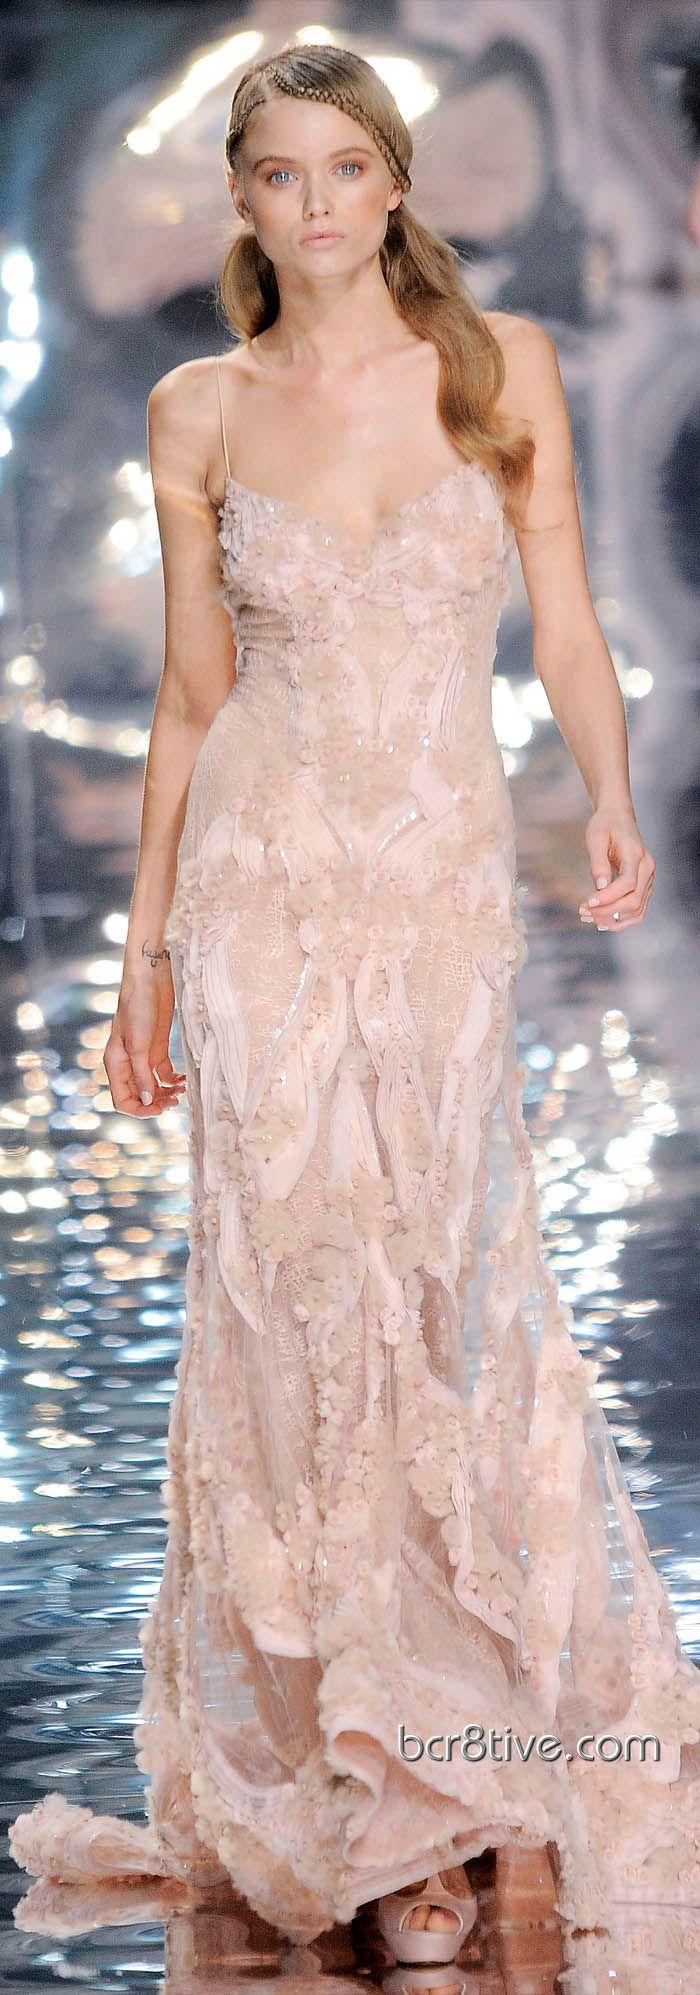 Elie Saab Spring Summer 2010 Haute Couture | Vestidos de fiesta ...